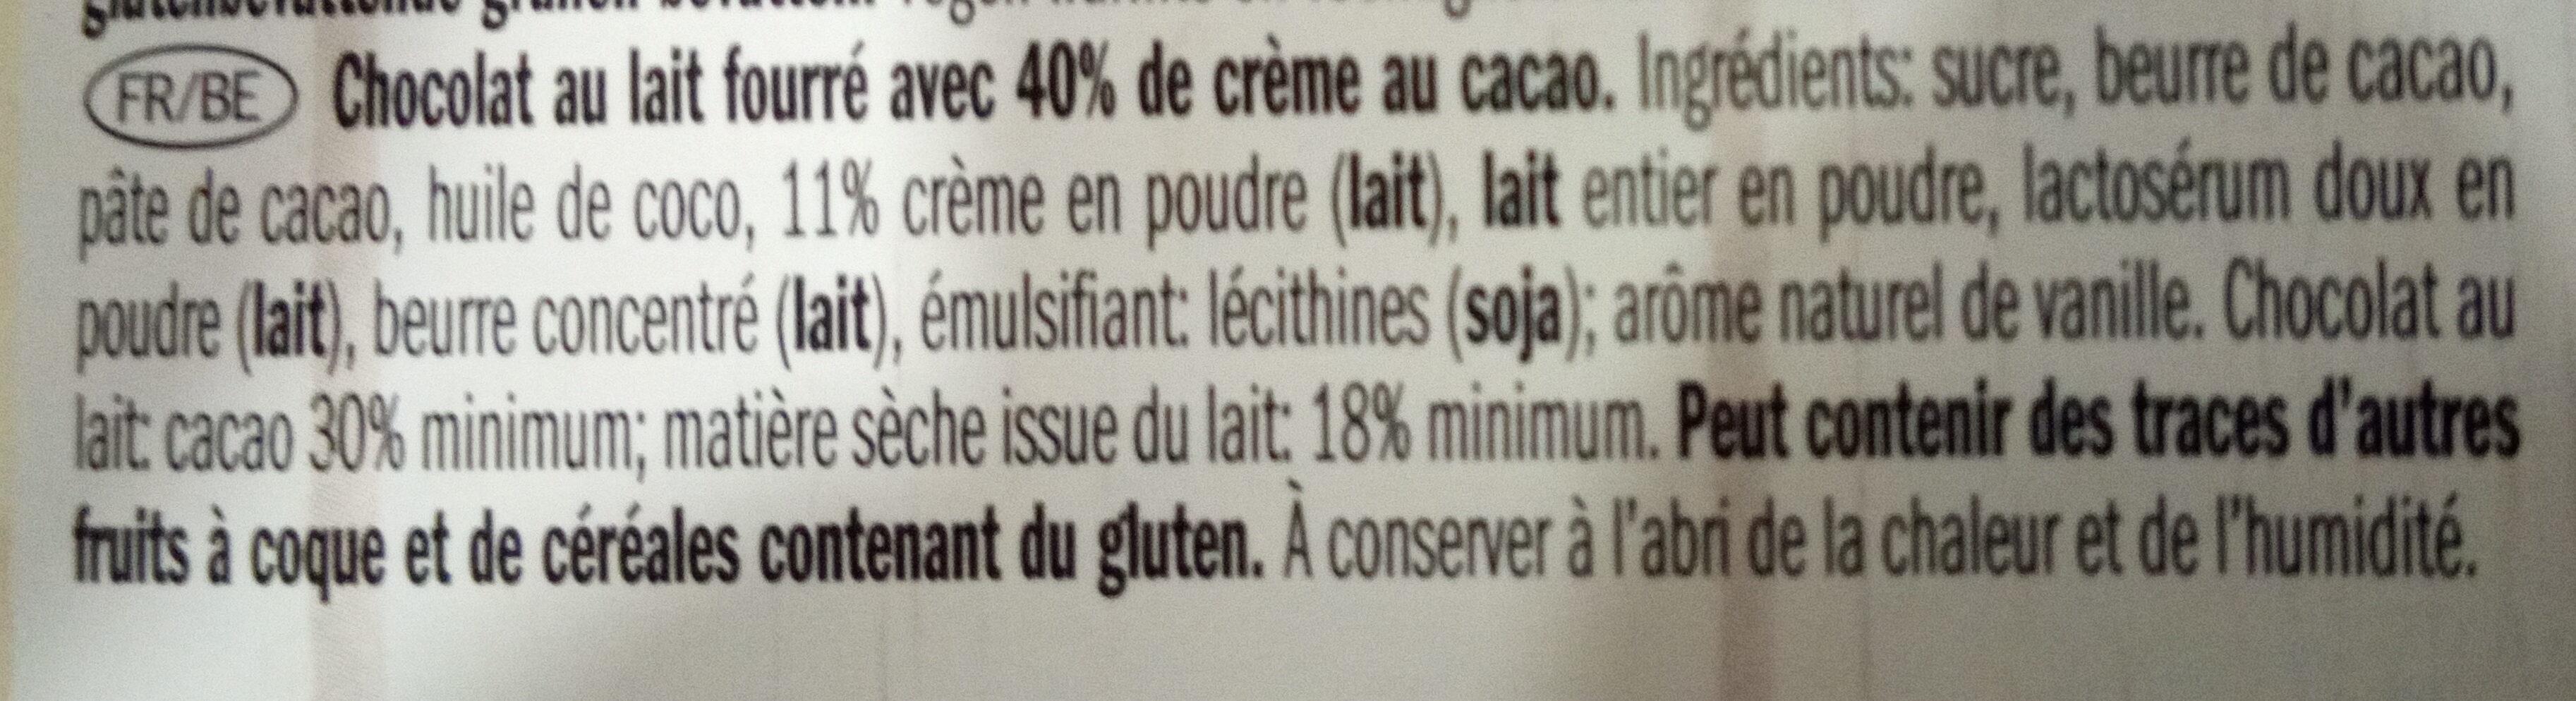 Vollmilchschokolade, Kakaocreme - Ingrediënten